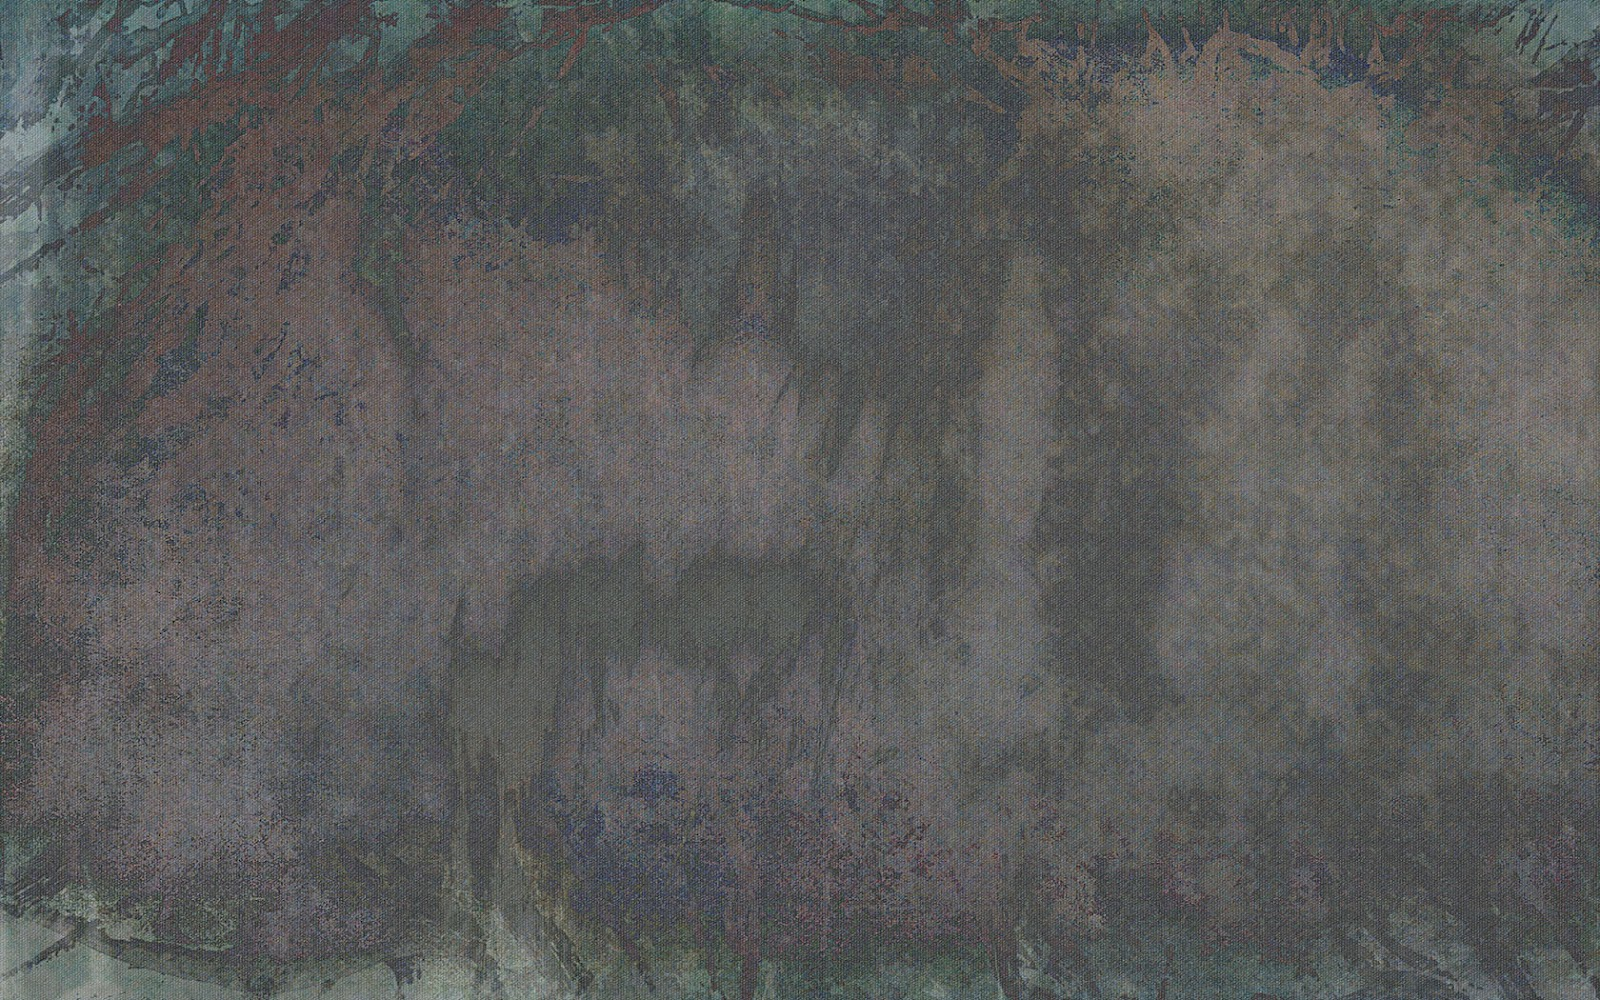 grey background tumblr - photo #4